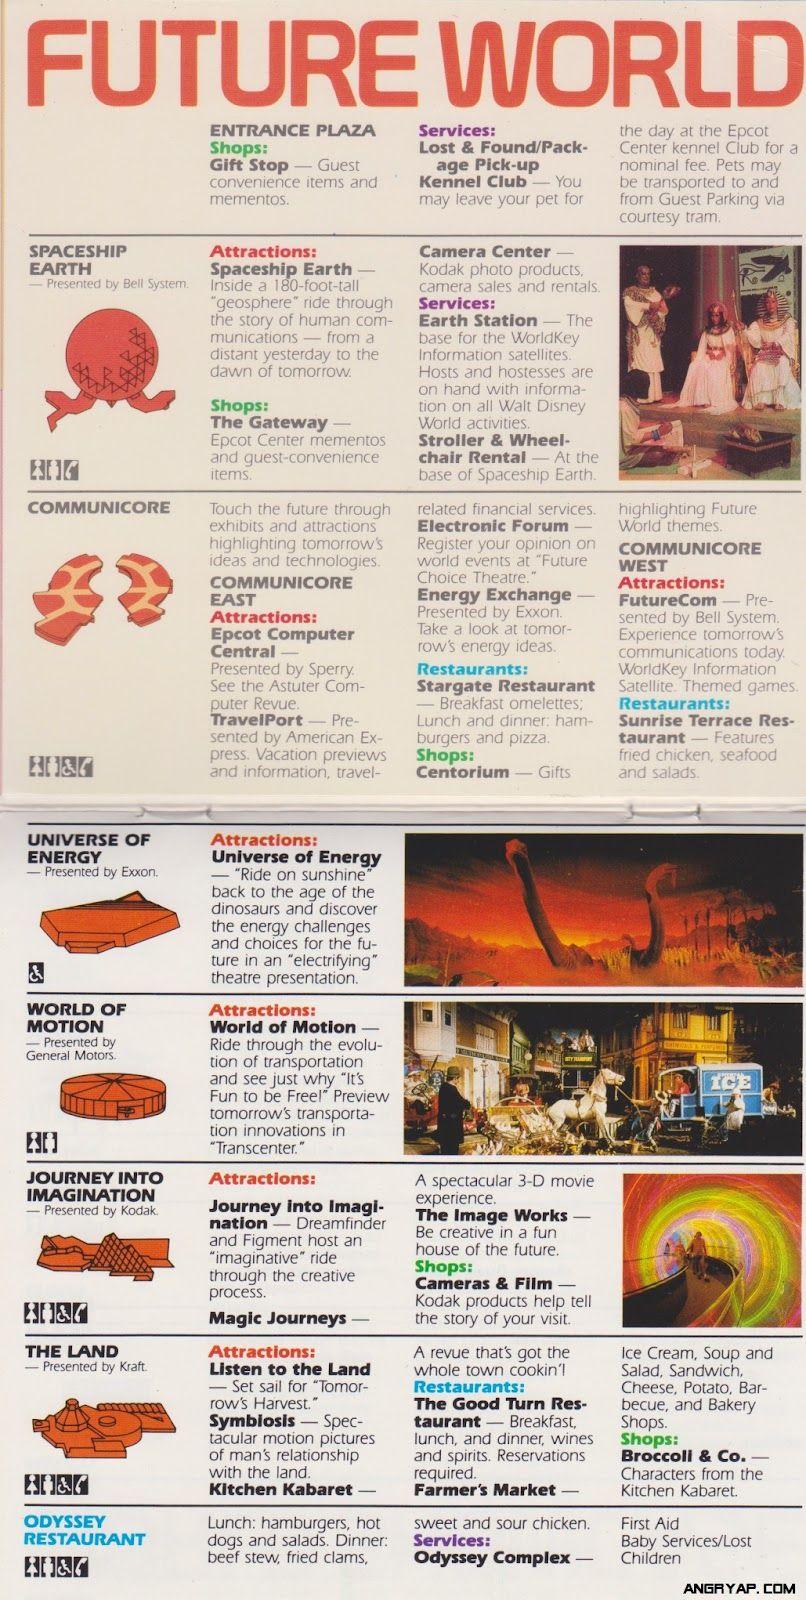 Kitchen Kabaret how I miss you   All Things Disney   Pinterest ...